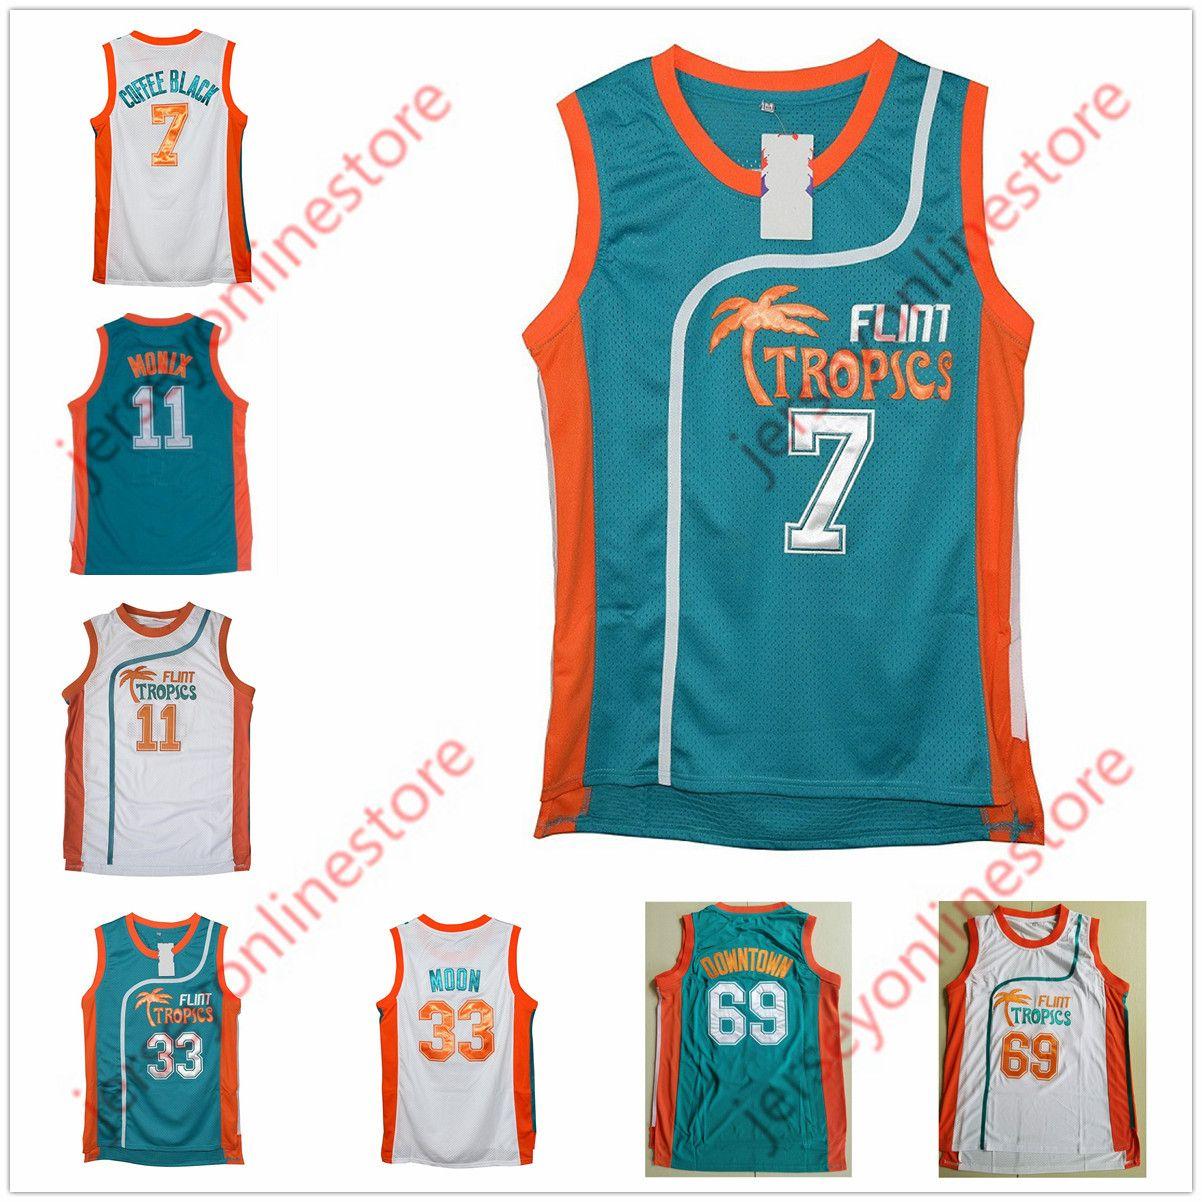 2019 Men Semi Pro Movie Flint Tropics 7  Coffee Black Jersey Stitched  Wholesale 33  Jackie Moon 69  Downtown 11  ED Monix Basketball Jerseys From  ... b6b120c83